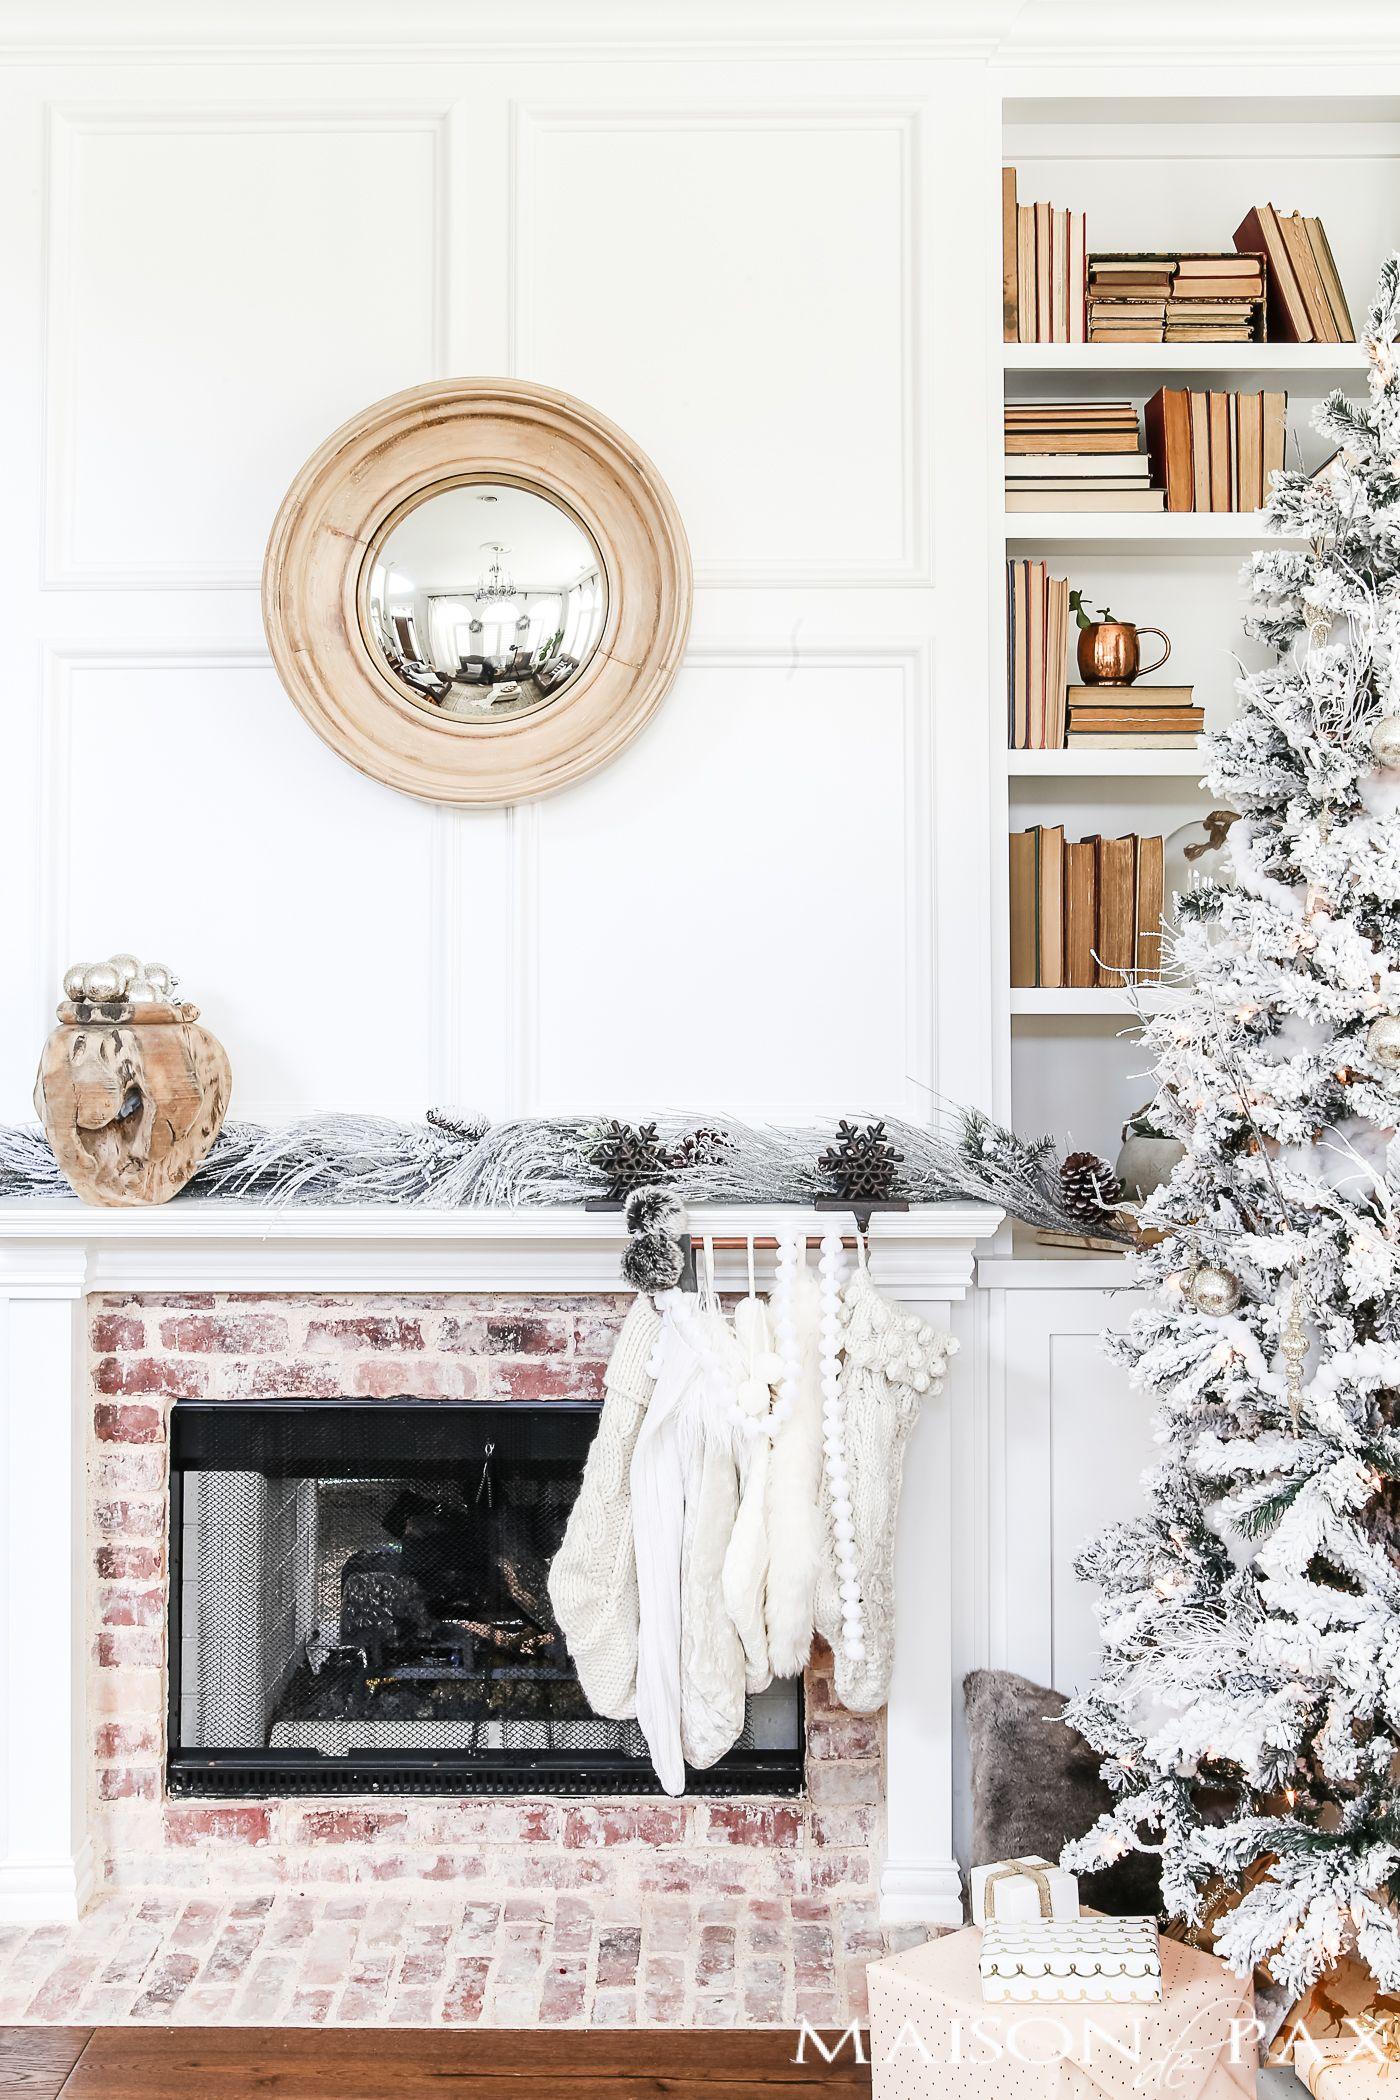 Tips for Simple, Elegant Holiday Decor | Christmas decor, Holidays ...